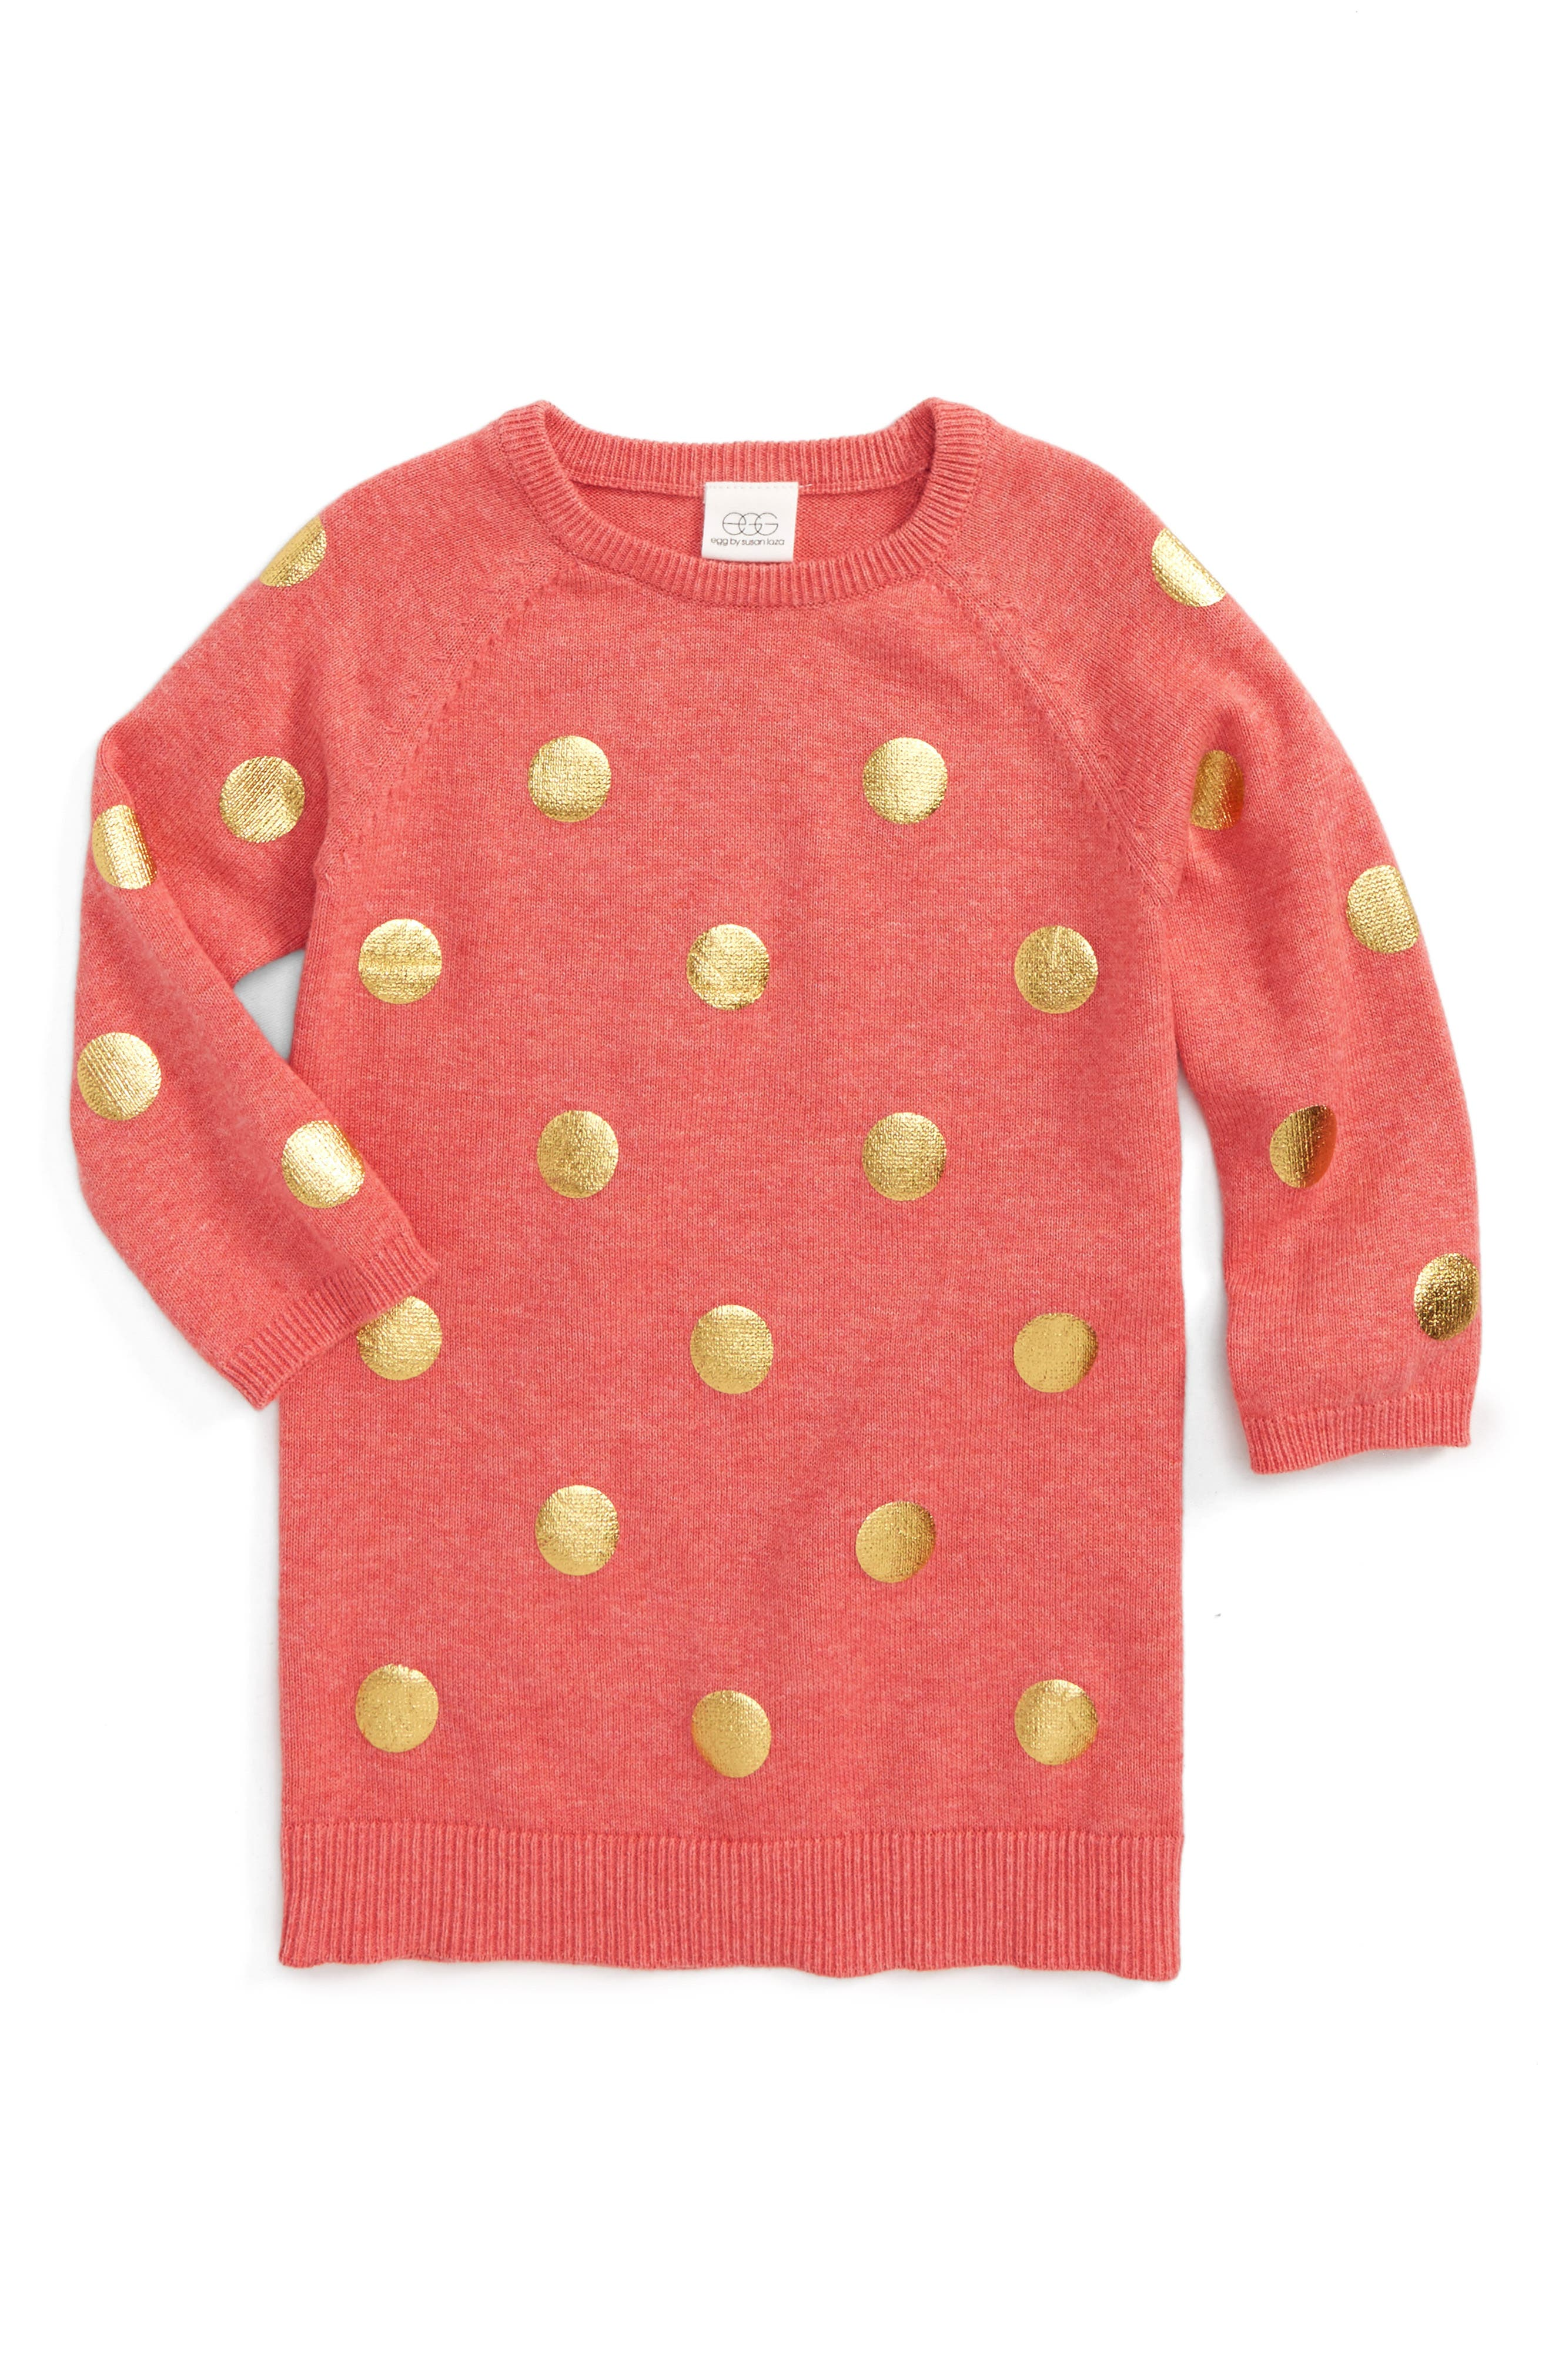 egg by susan lazar Emily Sweater Dress (Baby Girls)